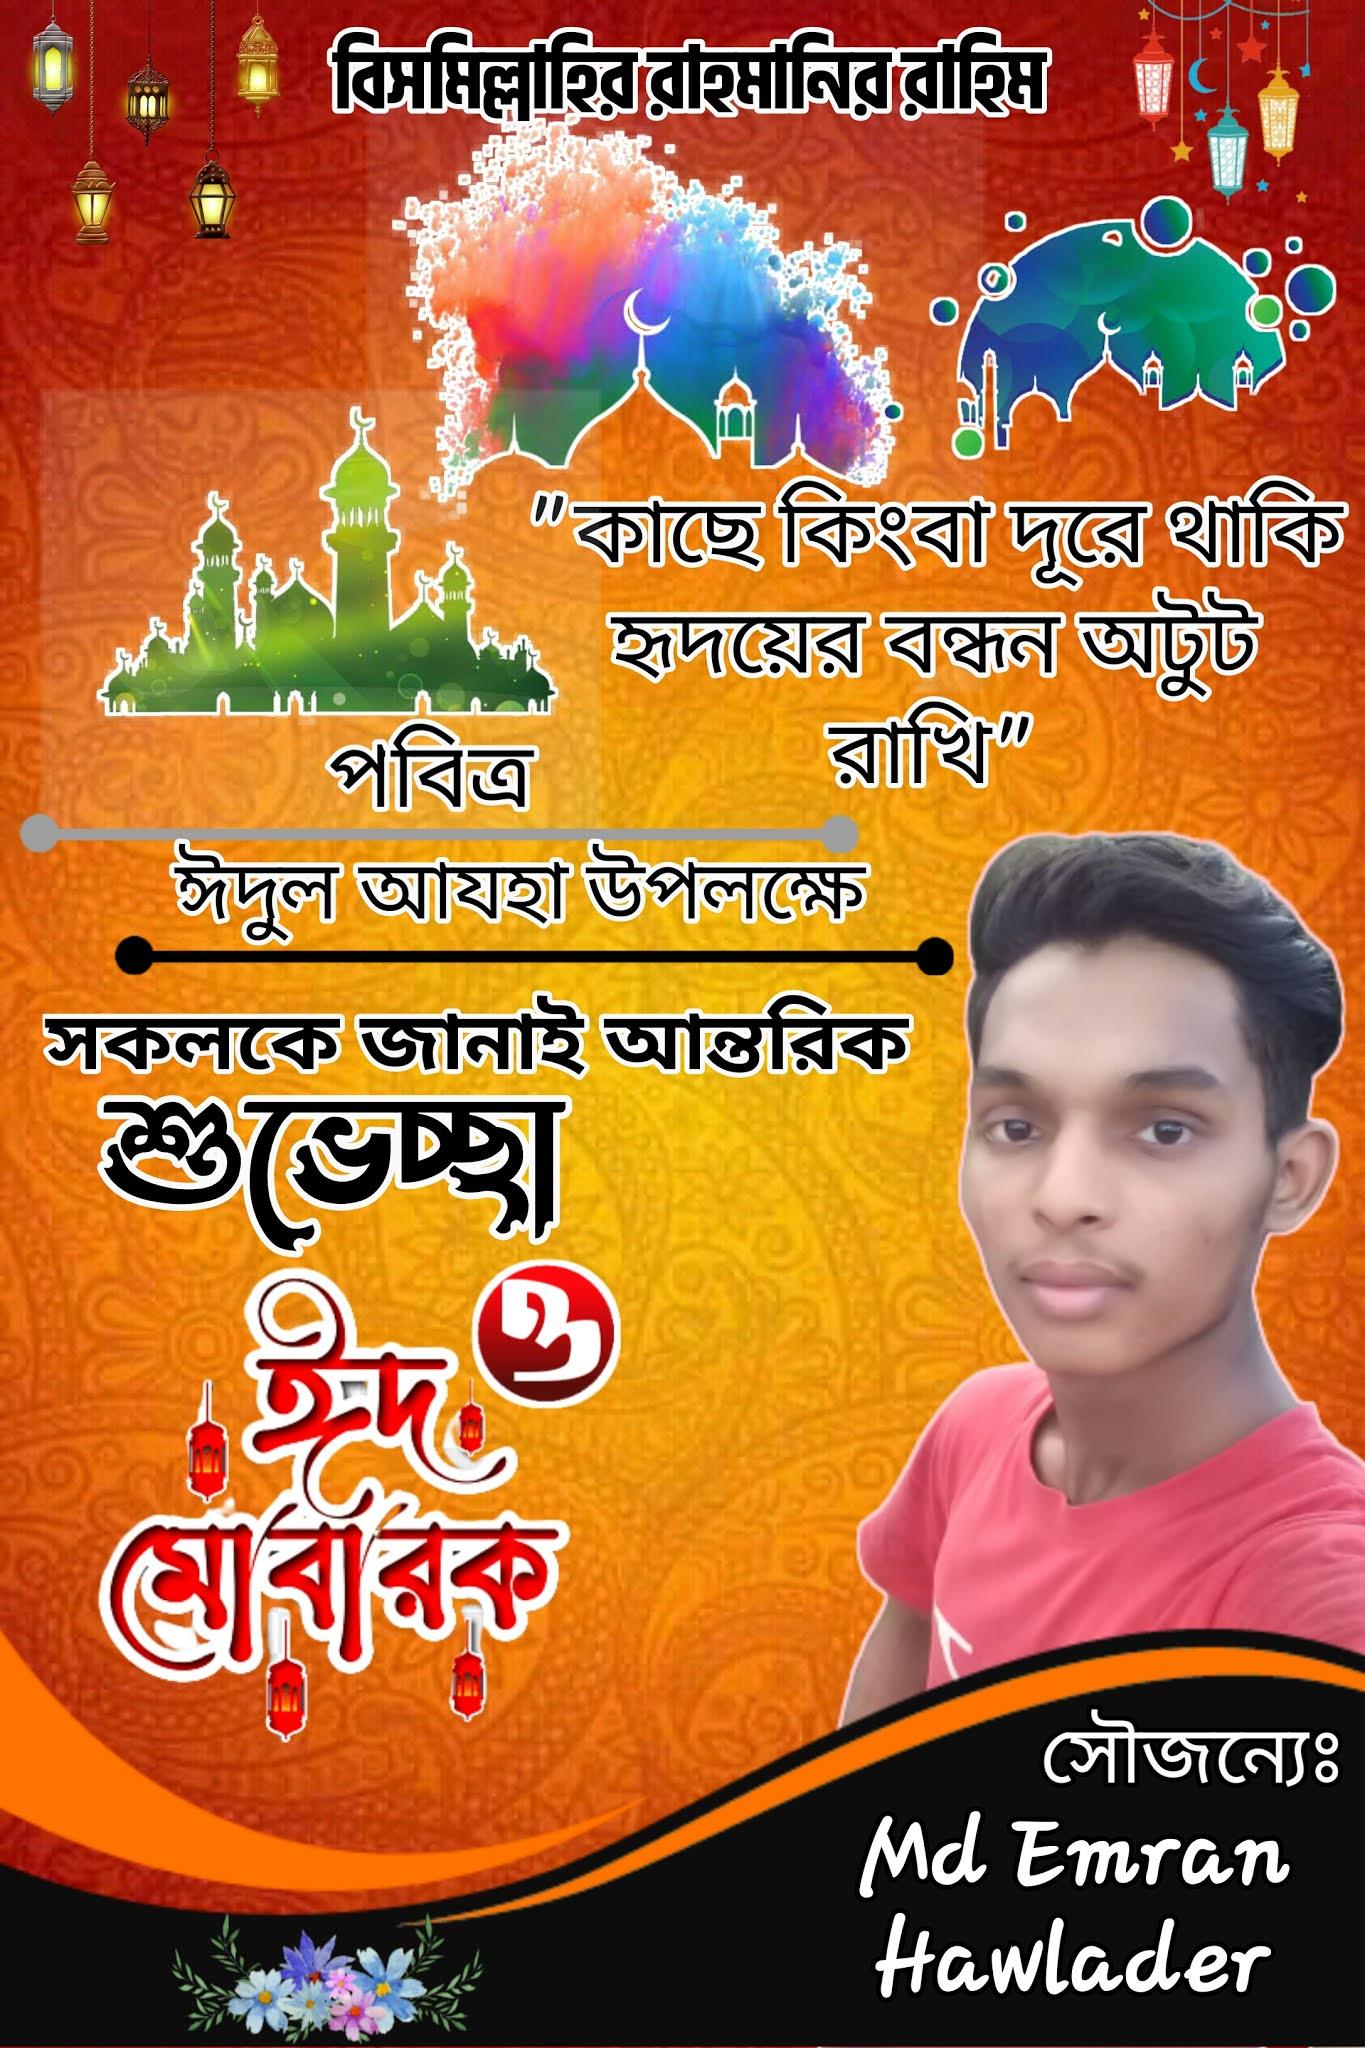 Eid Banner Design,  ঈদ উল আযহার ব্যানার ডিজাইন